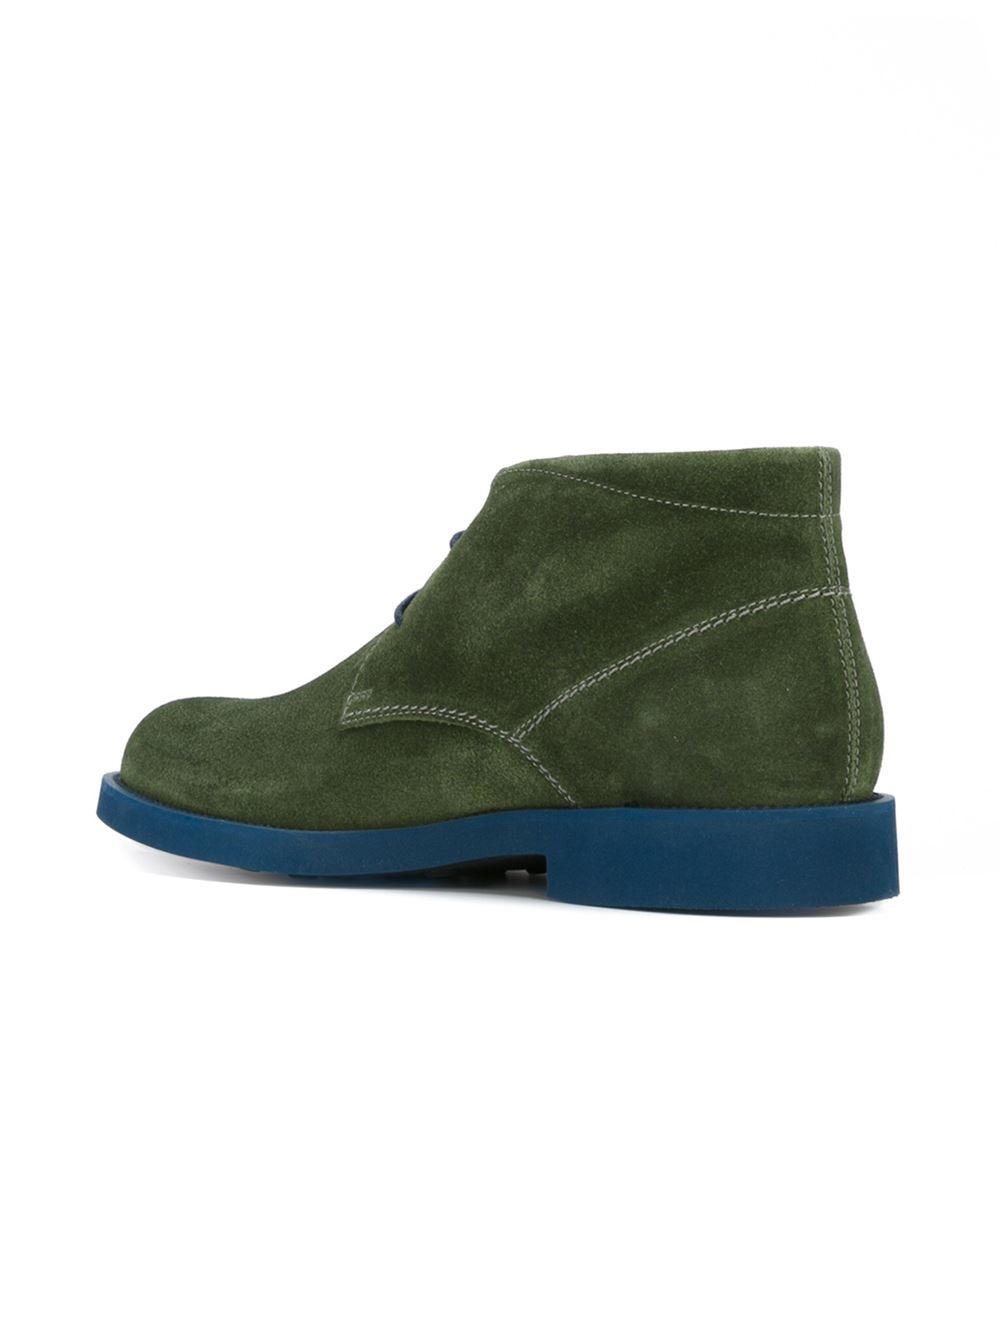 tod 39 s desert boots in green for men lyst. Black Bedroom Furniture Sets. Home Design Ideas